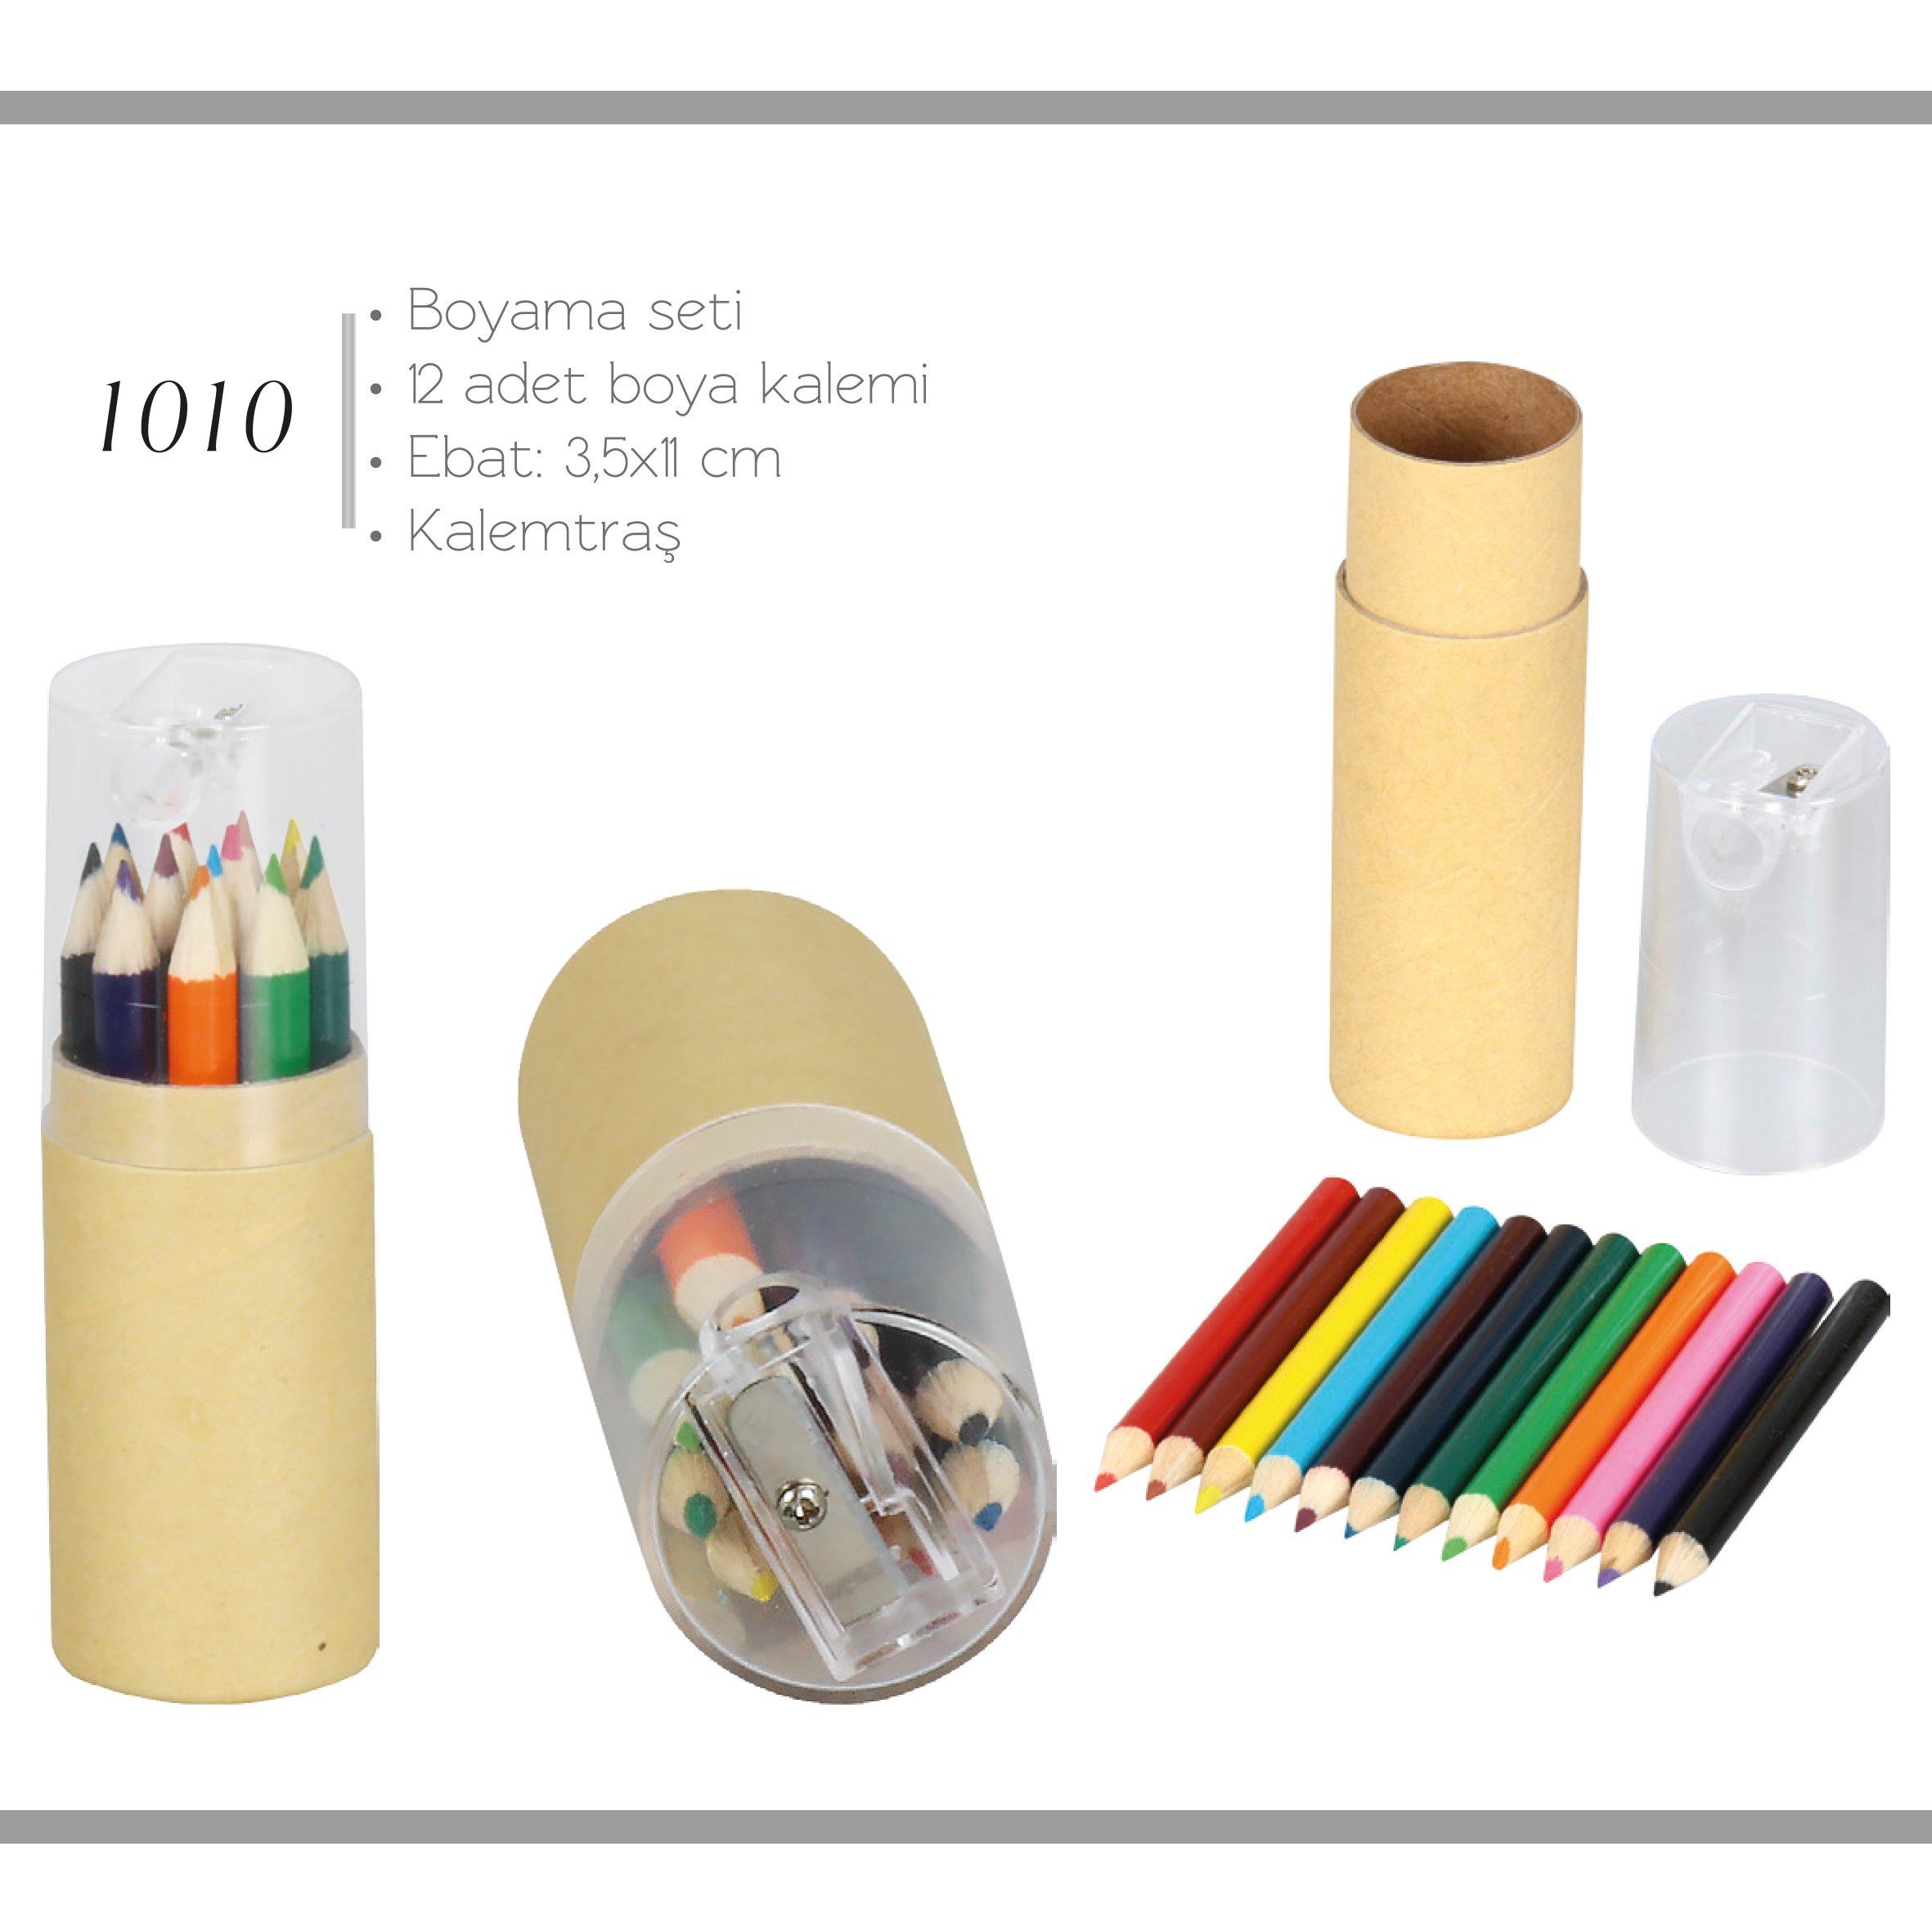 promosyon-promosyon ürünleri-promosyon kalemler-kurşun kalemler-promosyon ahşap kurşun kalem seti 1010